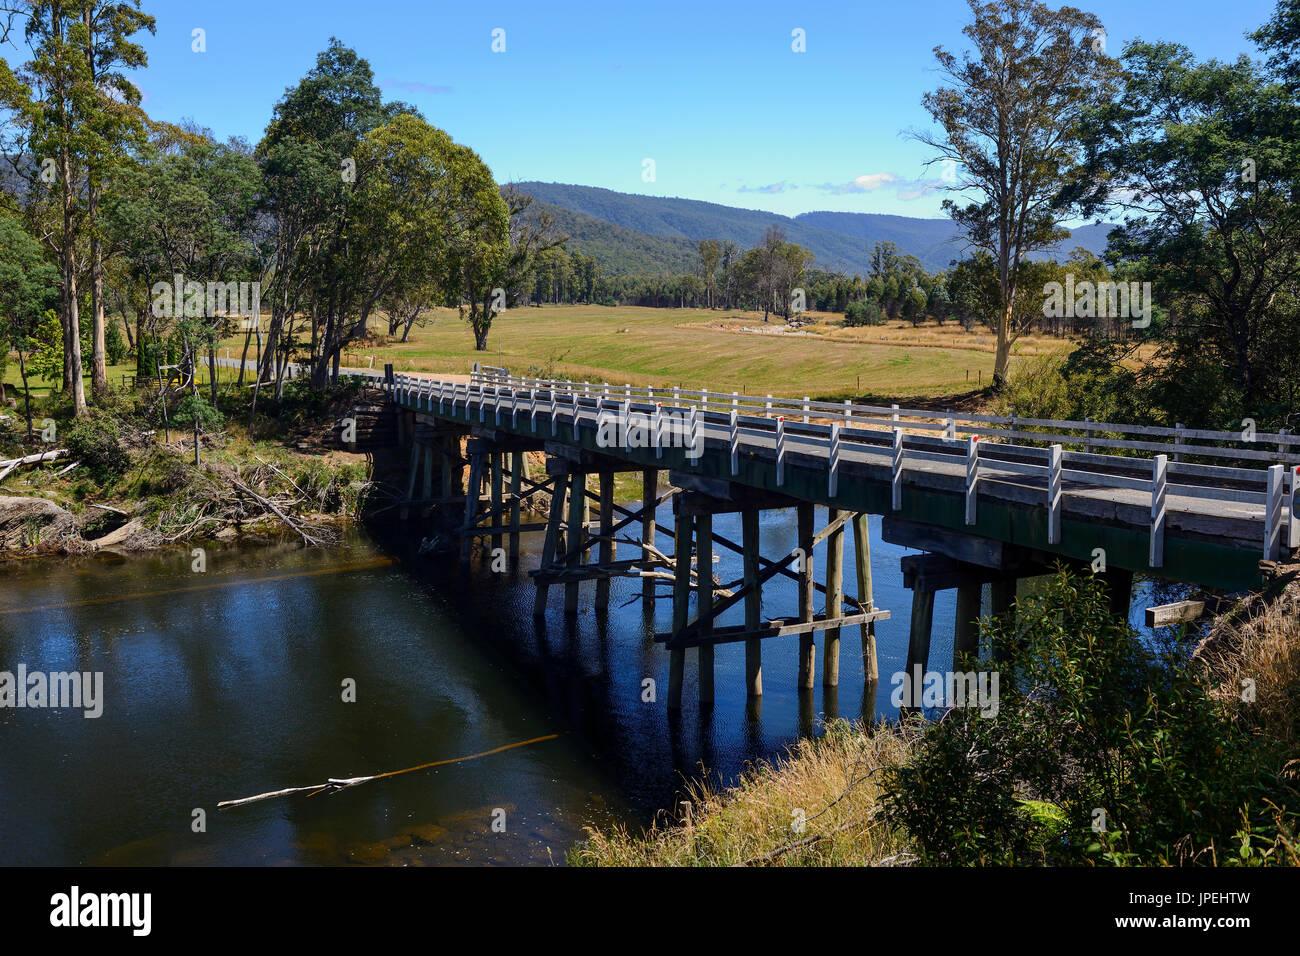 Trestle bridge over Mersey River on Liena Road in Northern Tasmania, Australia - Stock Image